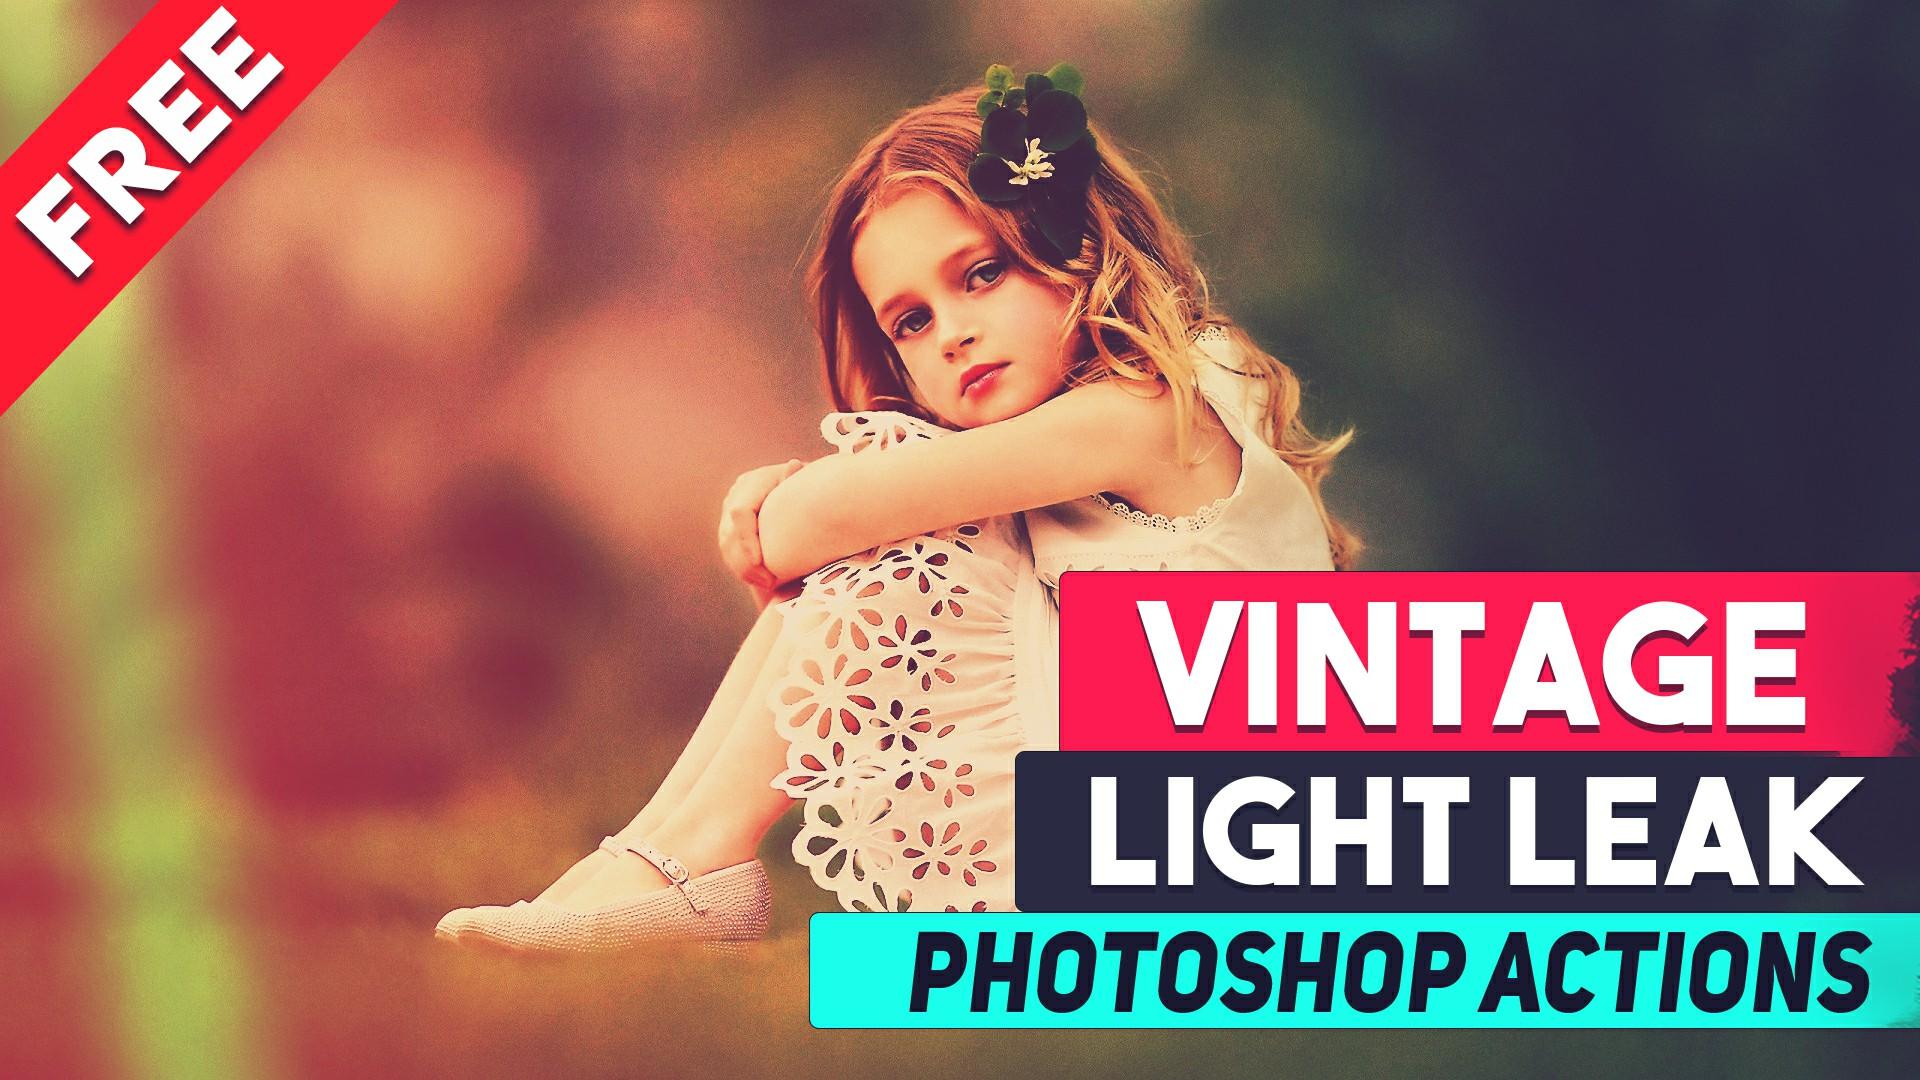 Vintage Light Leak Free Photoshop Actions